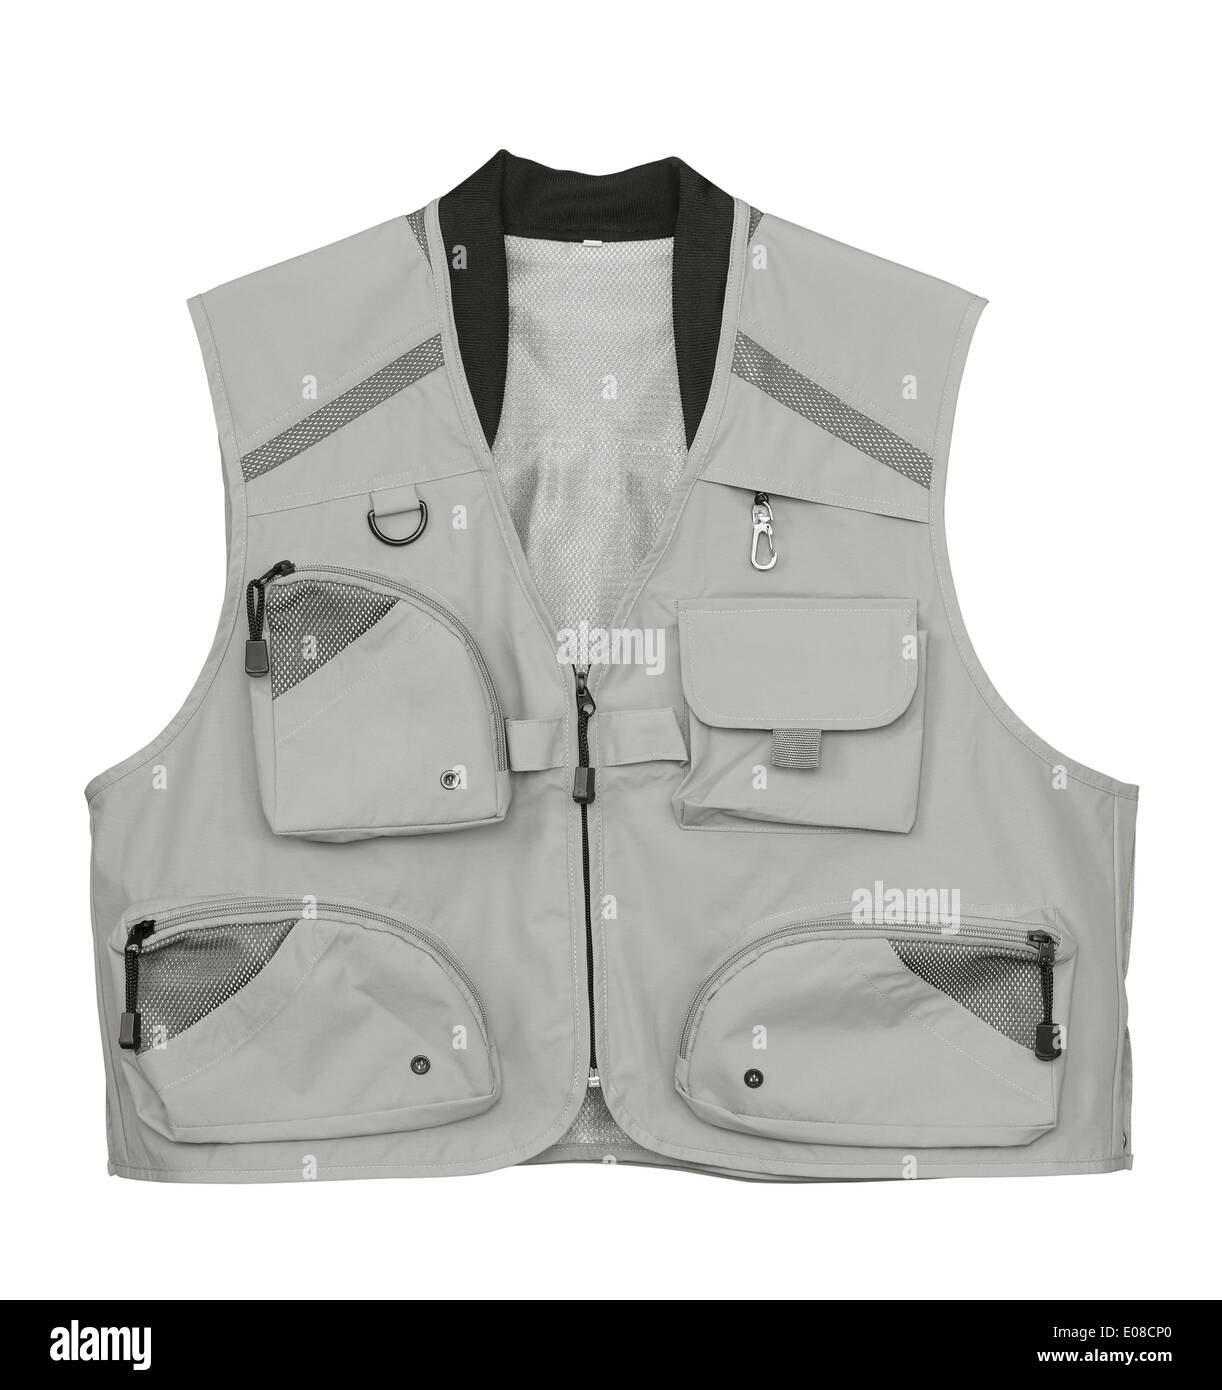 Fly fishing vest isolated on white - Stock Image